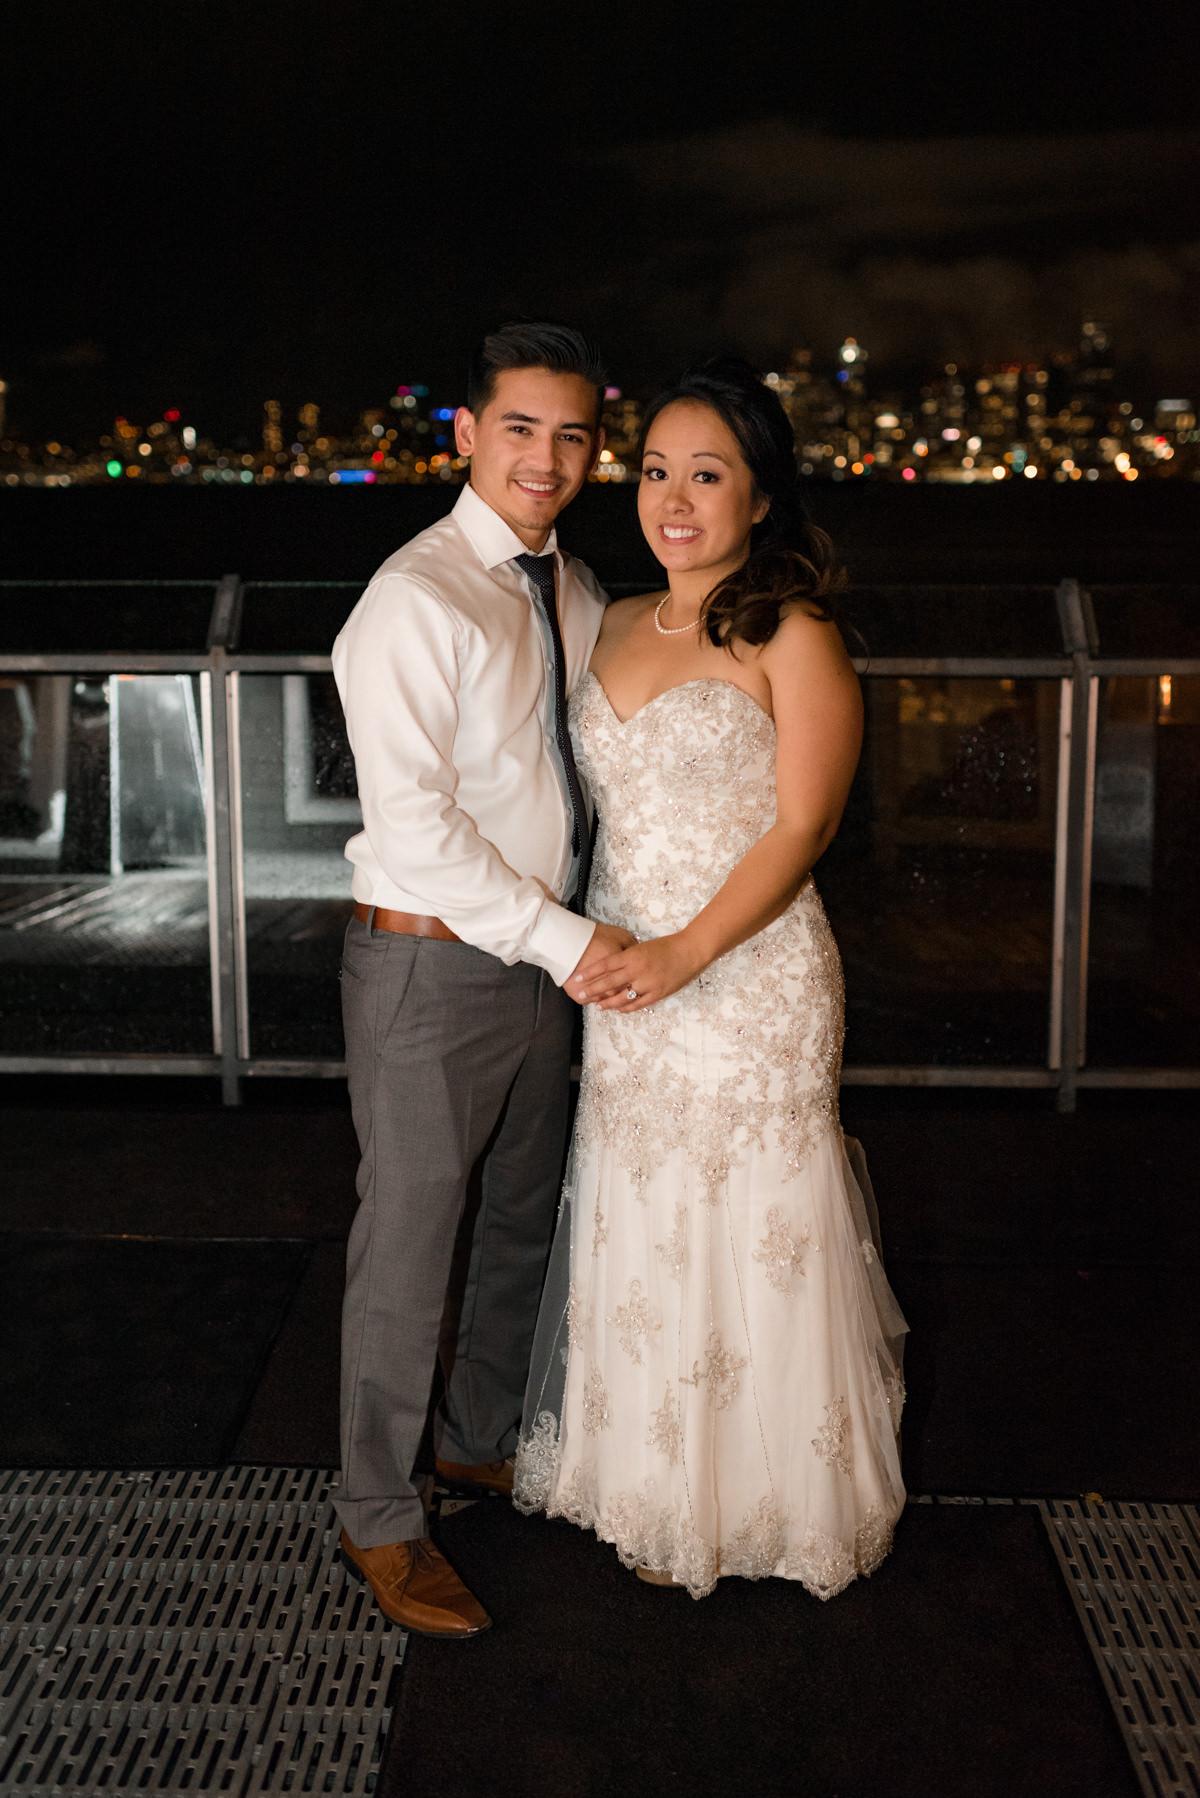 Andrew Tat - Documentary Wedding Photography - Salty's - Seattle, Washington -Mark & Marcy - 30.jpg